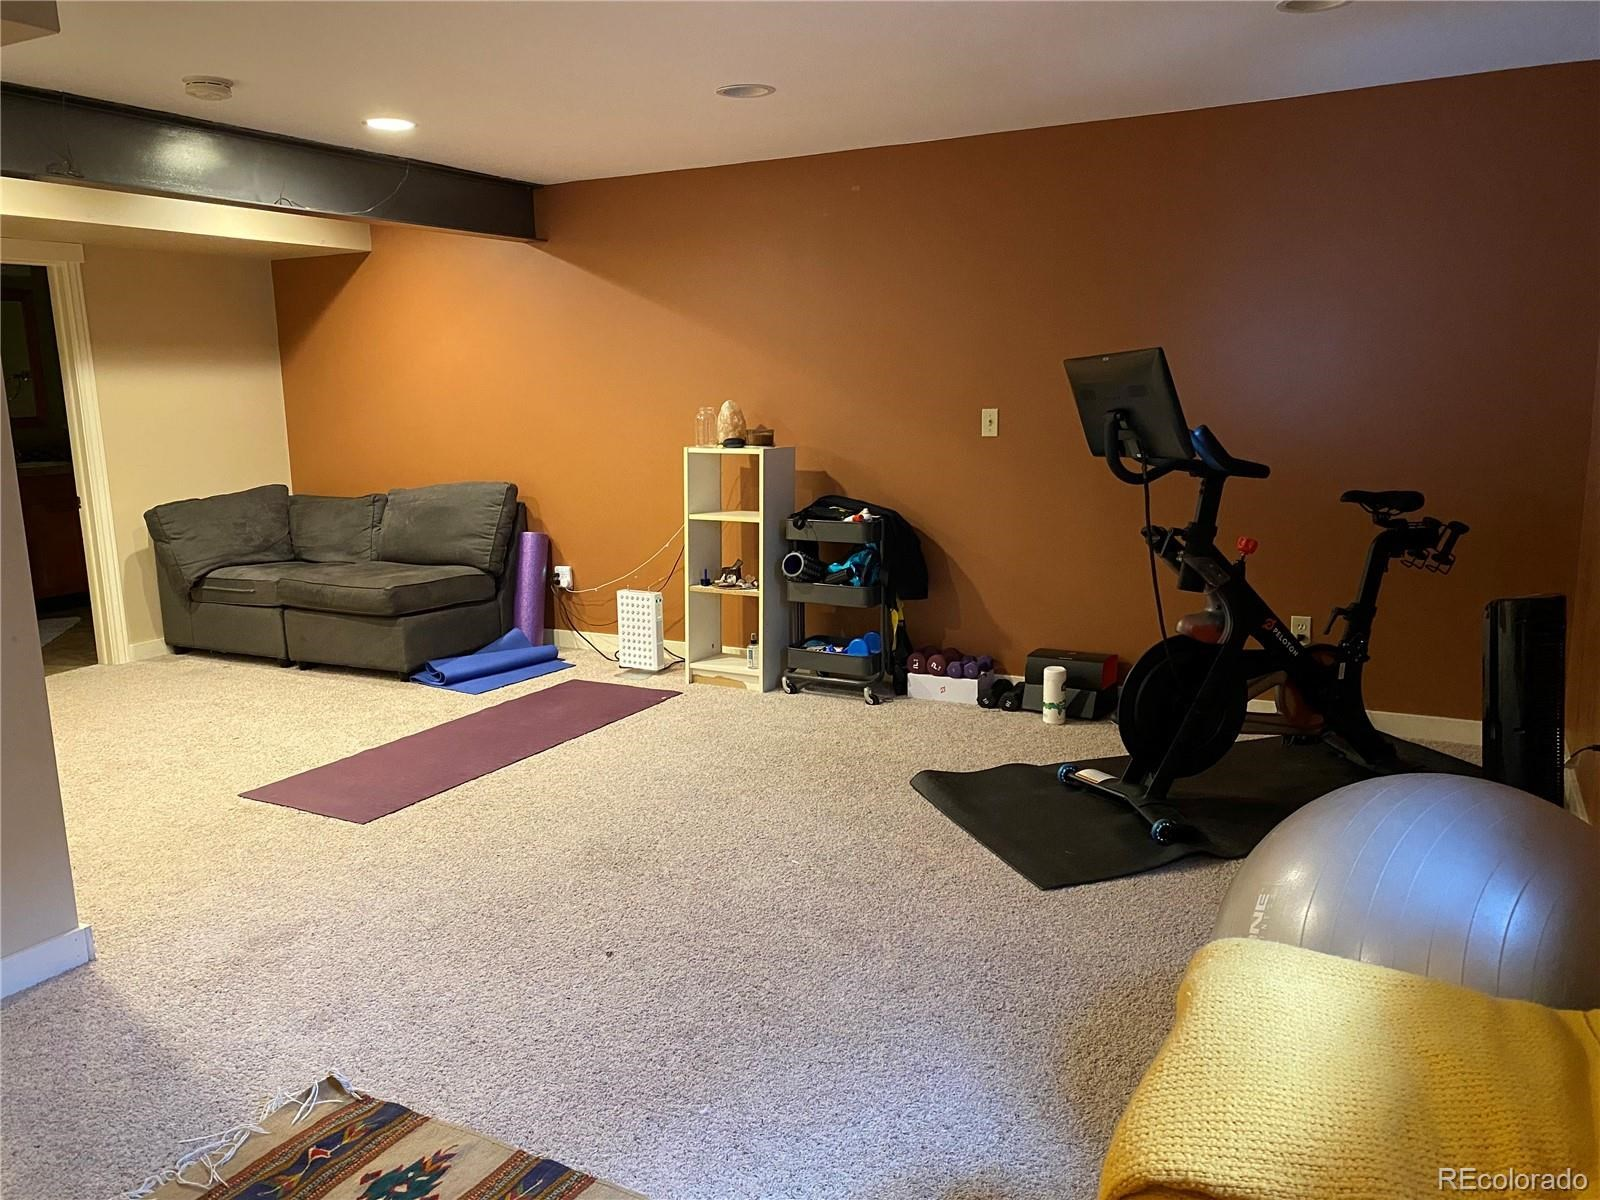 MLS# 5956538 - 19 - 1550 Chambers Drive, Boulder, CO 80305